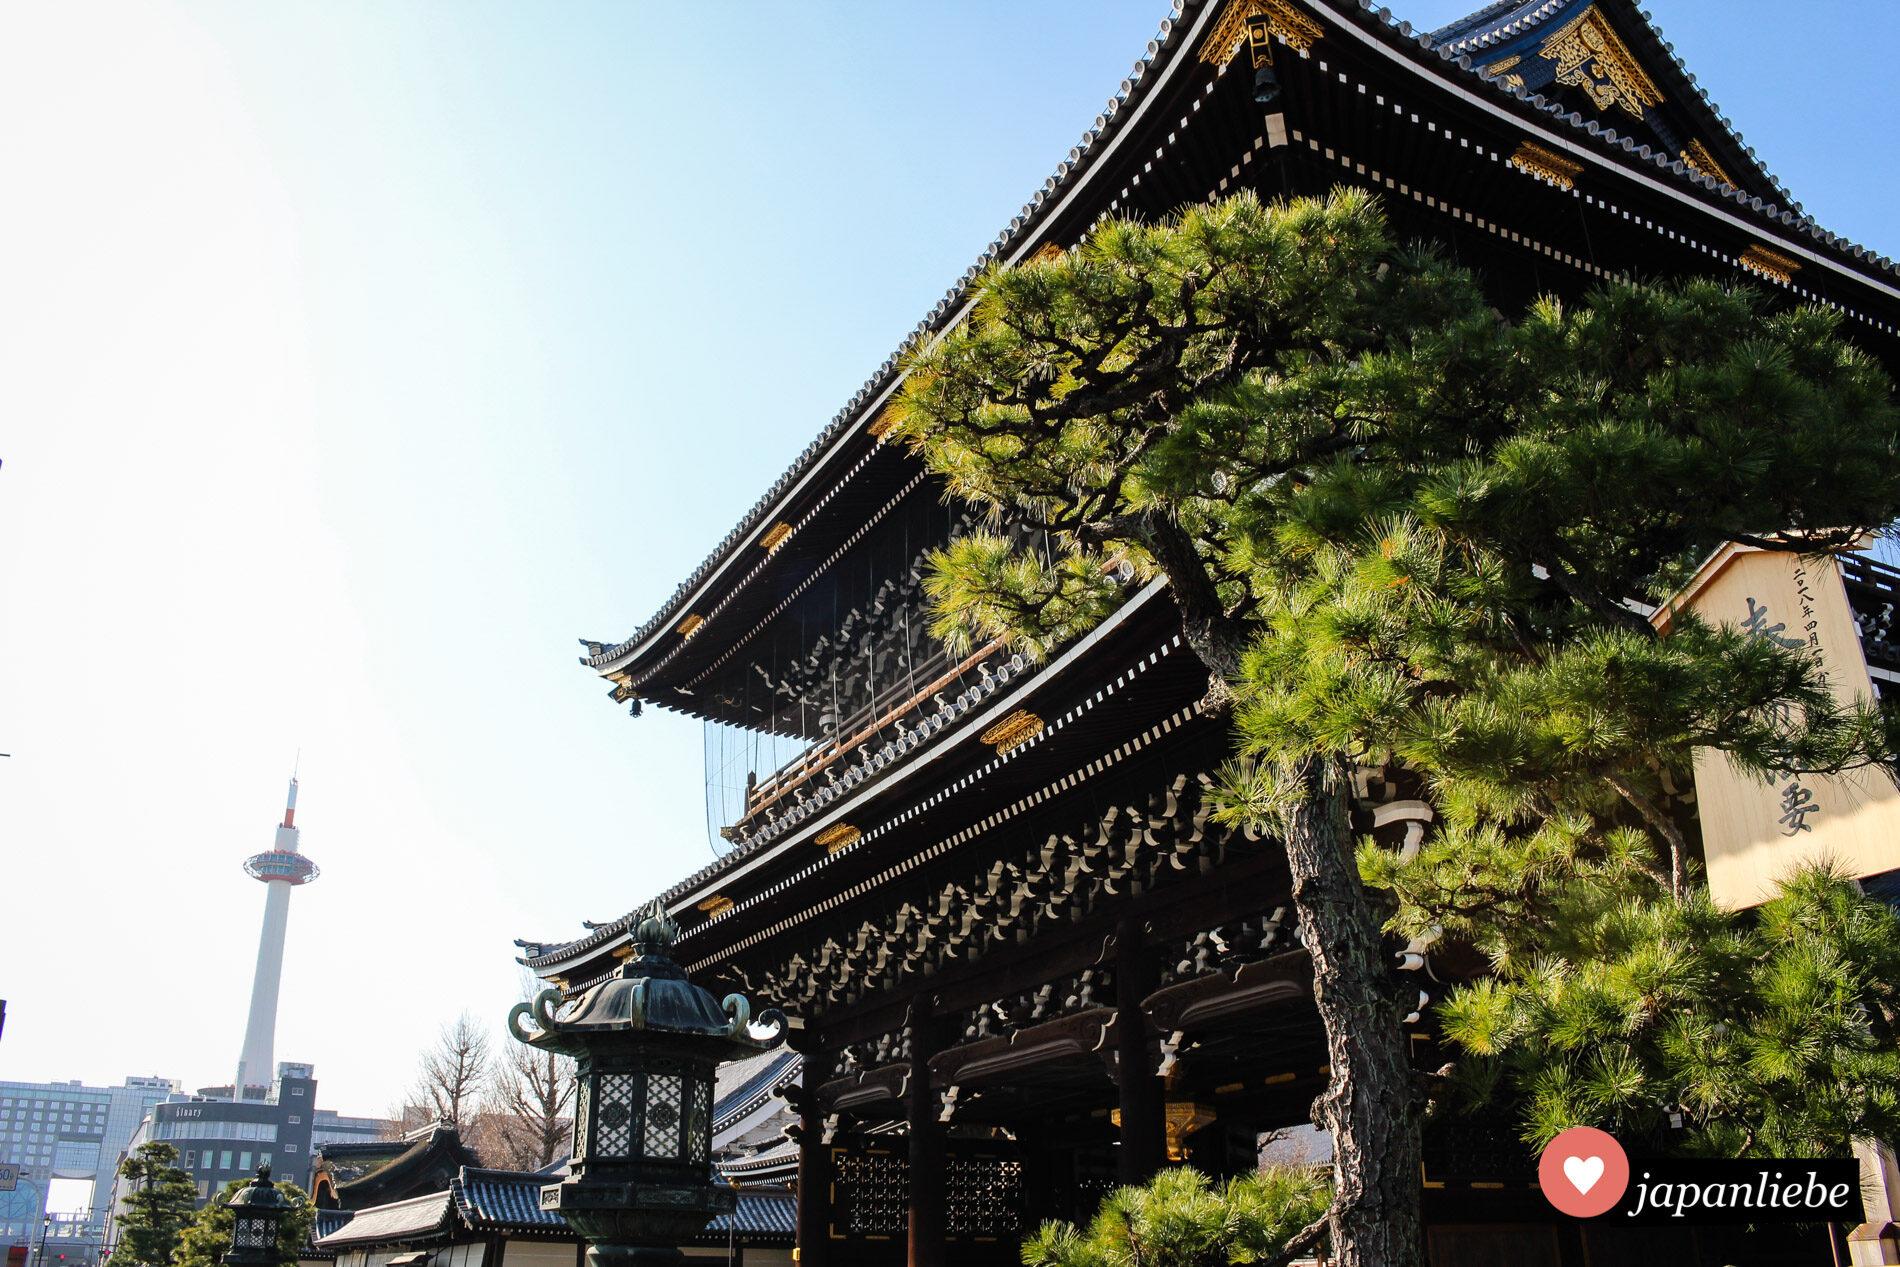 Der Hongan-ji-Tempel mit dem Kyōto Tower im Hintergrund.